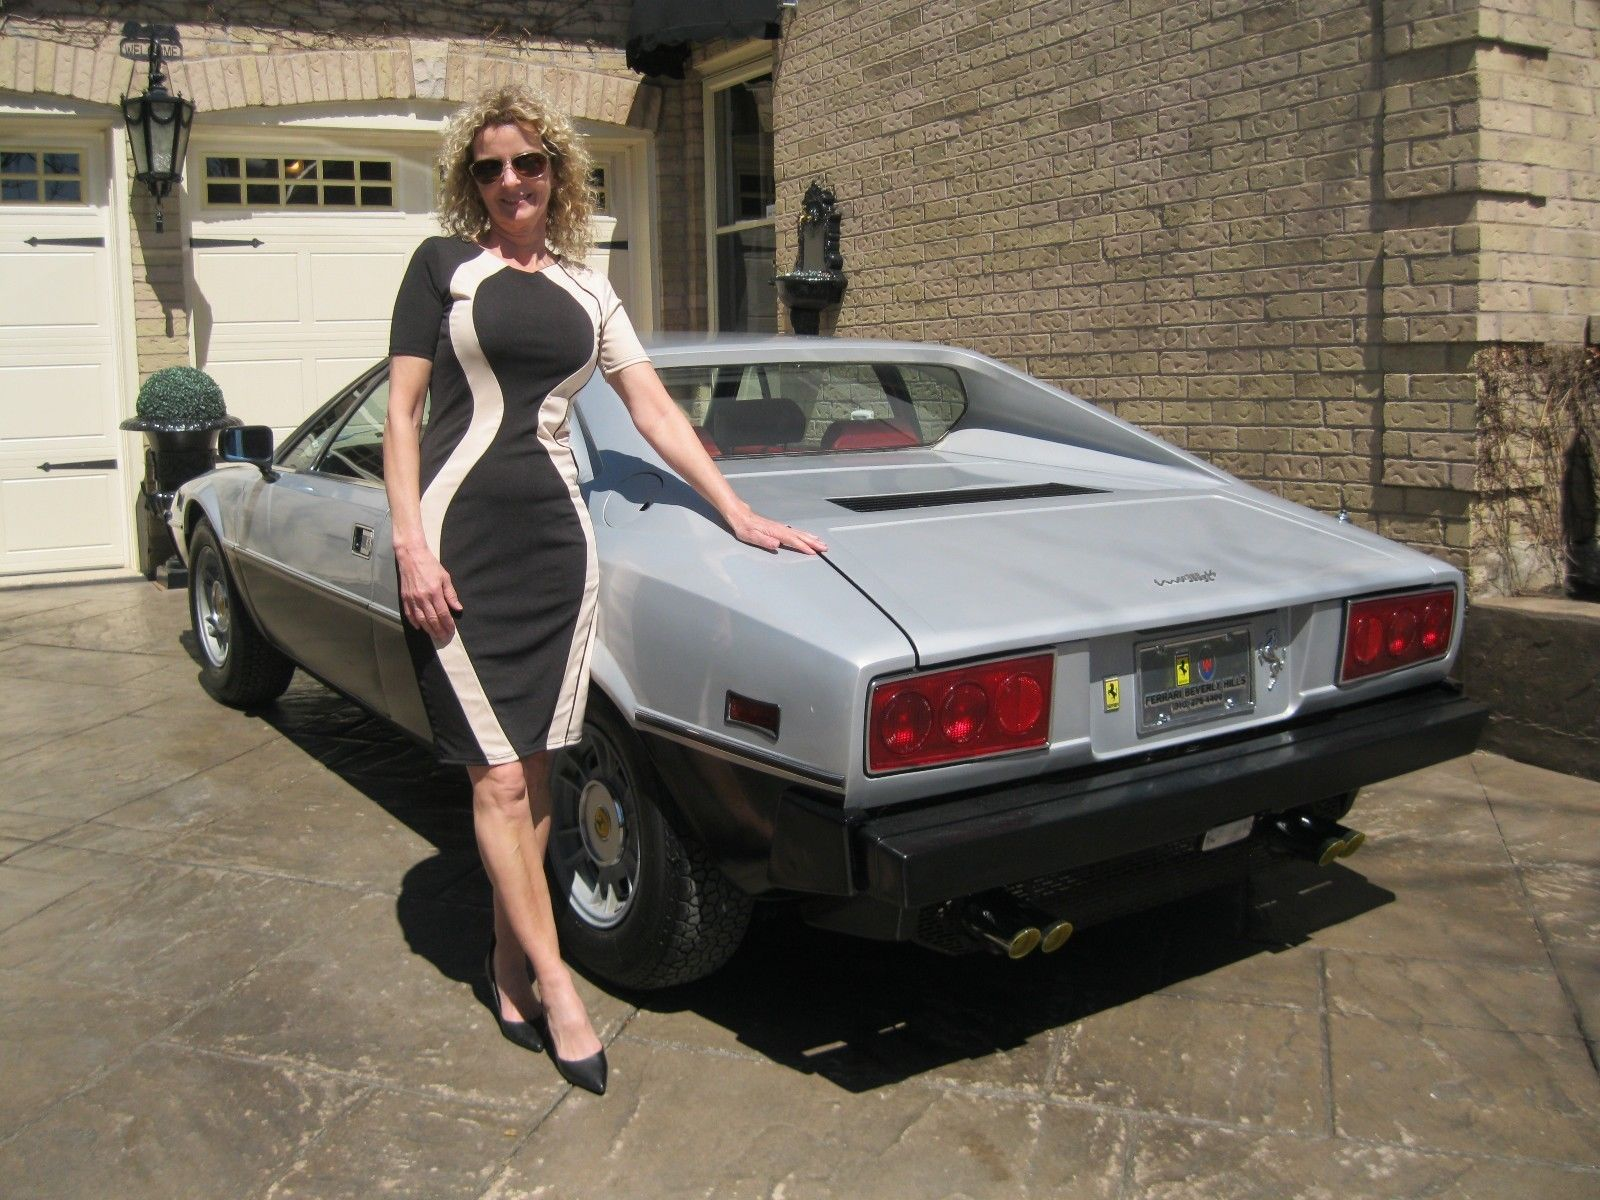 Amazing 1975 Ferrari 308 Boxer 1975 Ferrari Dino 308 GT4, Boxer, Series 1,  27K Miles,Original, No Reserve 2018,2019